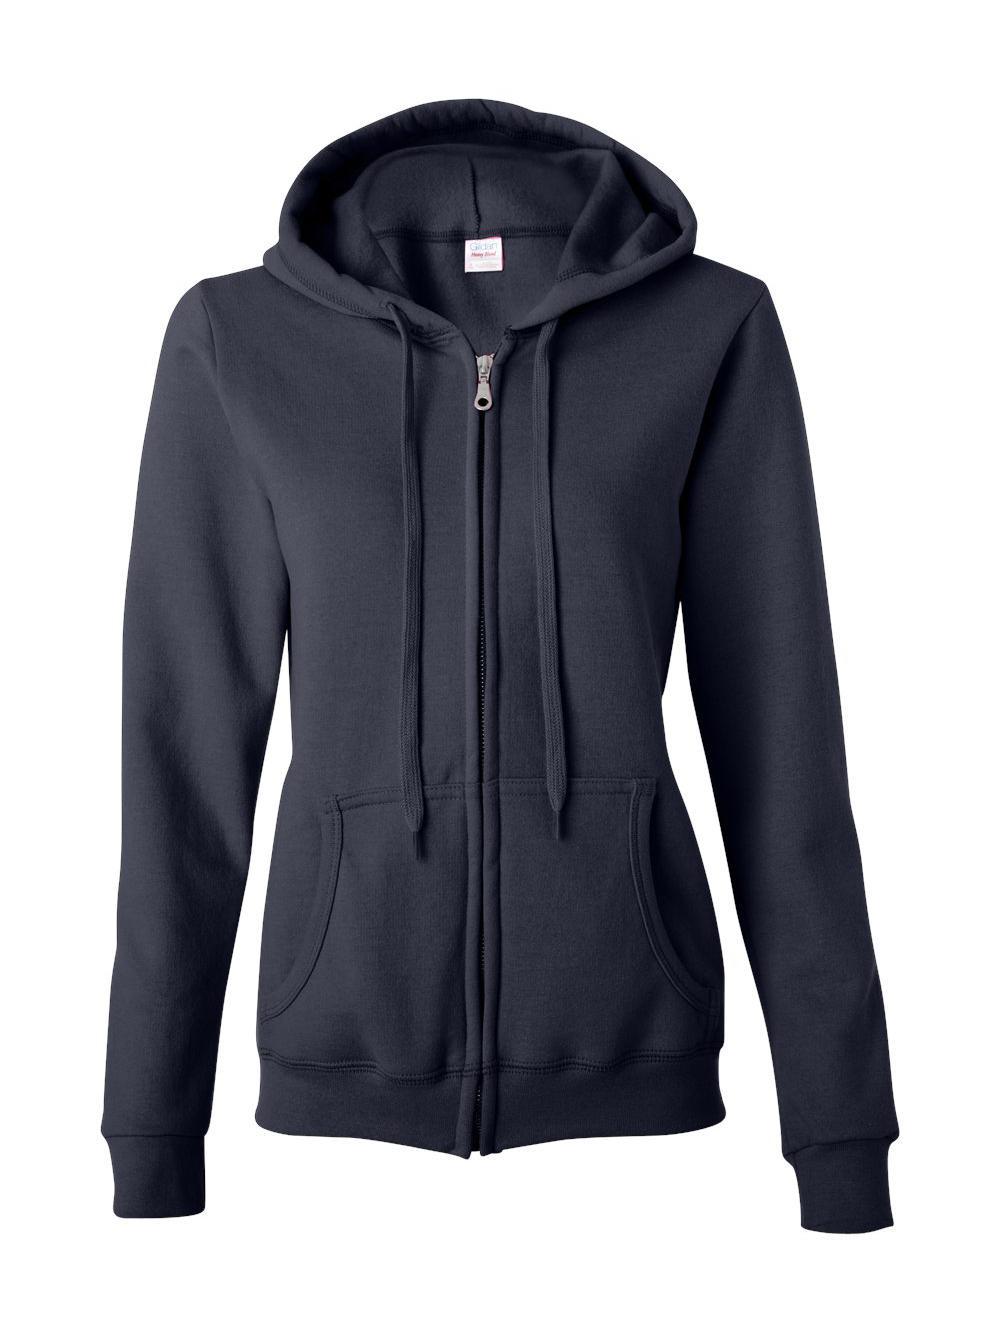 Gildan-Heavy-Blend-Women-039-s-Full-Zip-Hooded-Sweatshirt-18600FL thumbnail 9